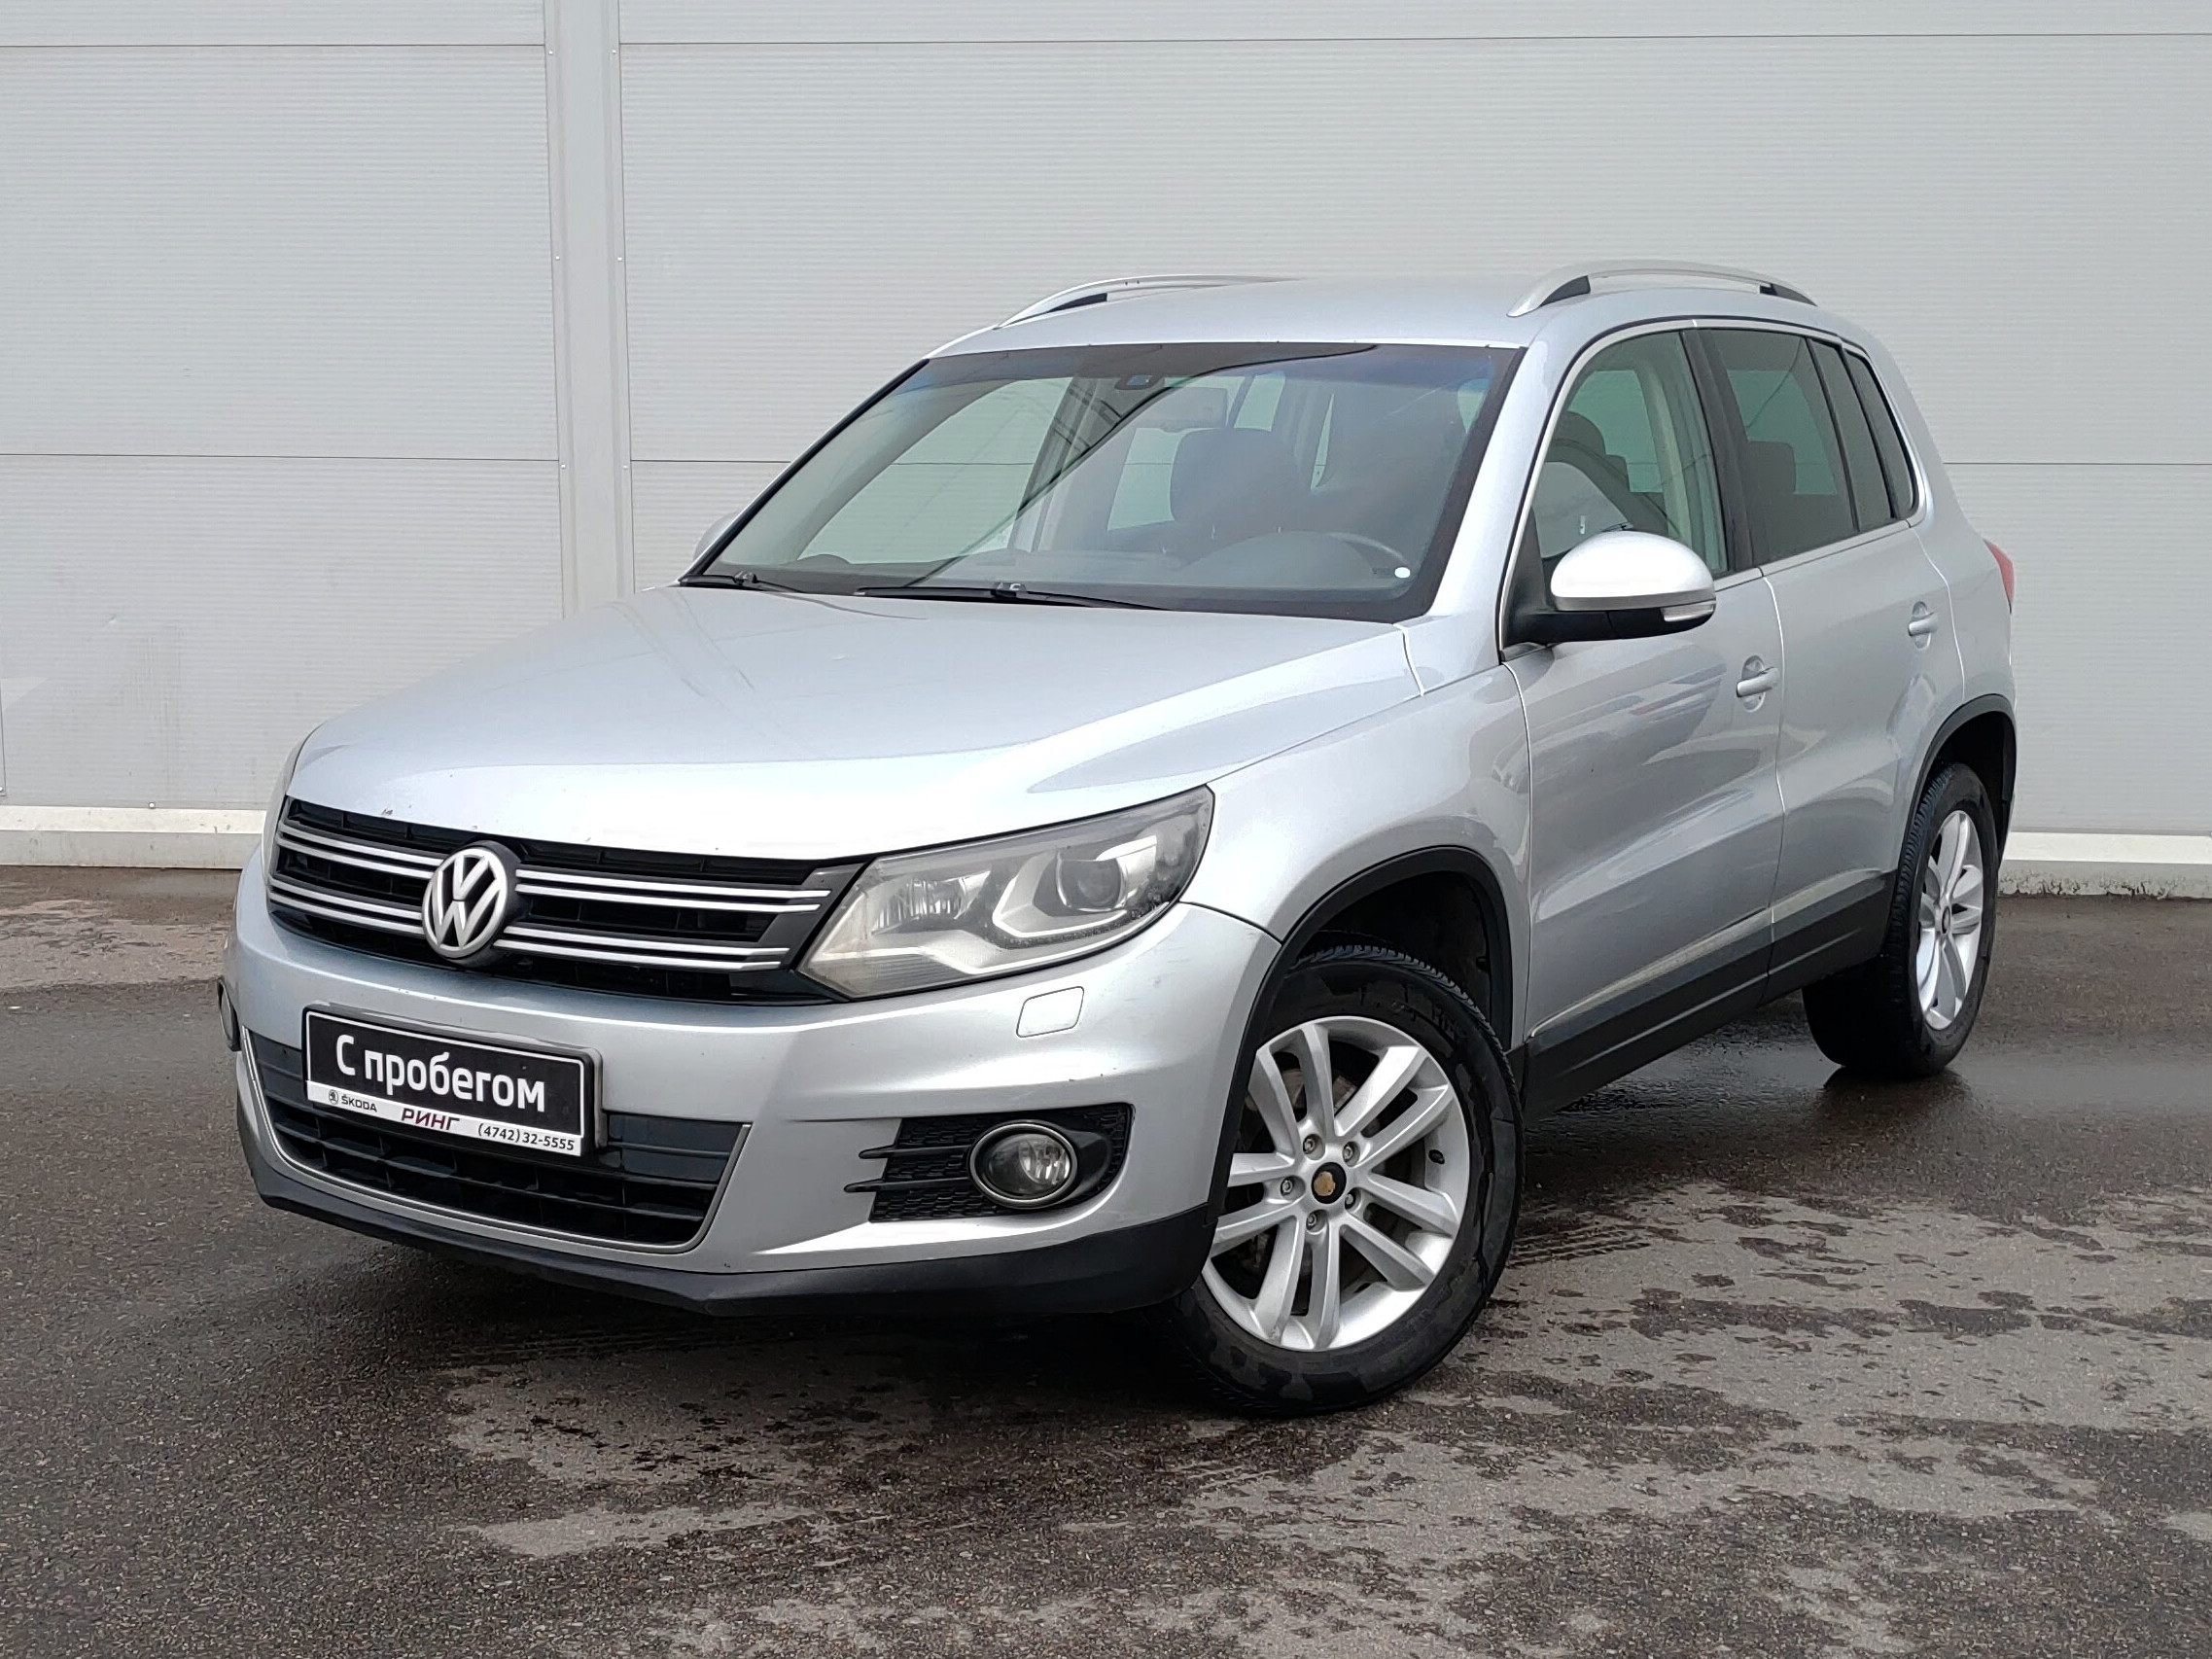 Volkswagen Tiguan Внедорожник (2012г.)